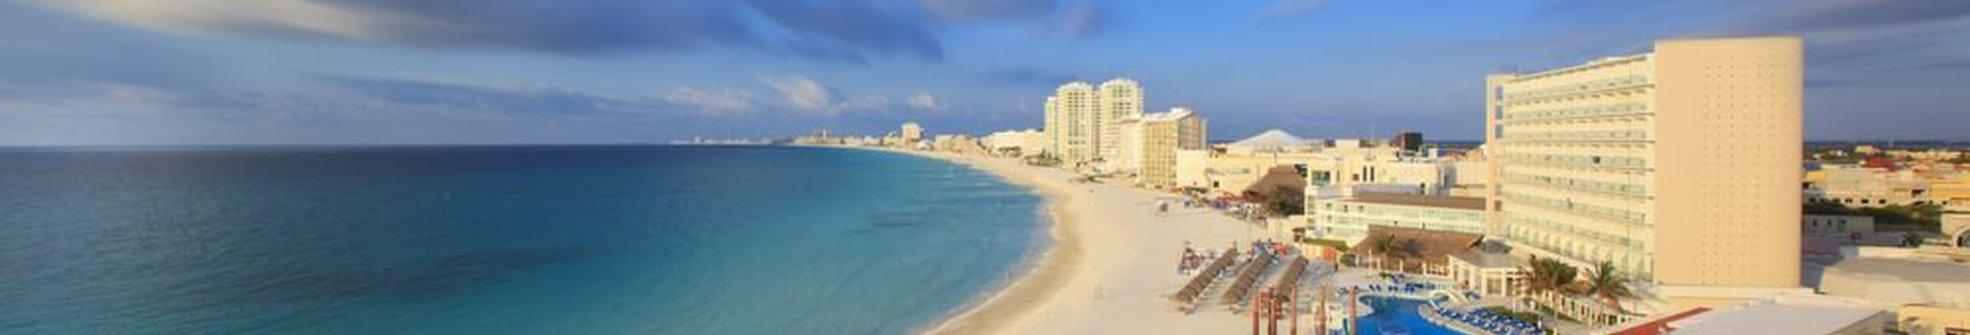 Krystal Cancún Hotel Map, OFFICIAL WEBSITE | Cancún Krystal Cancún on